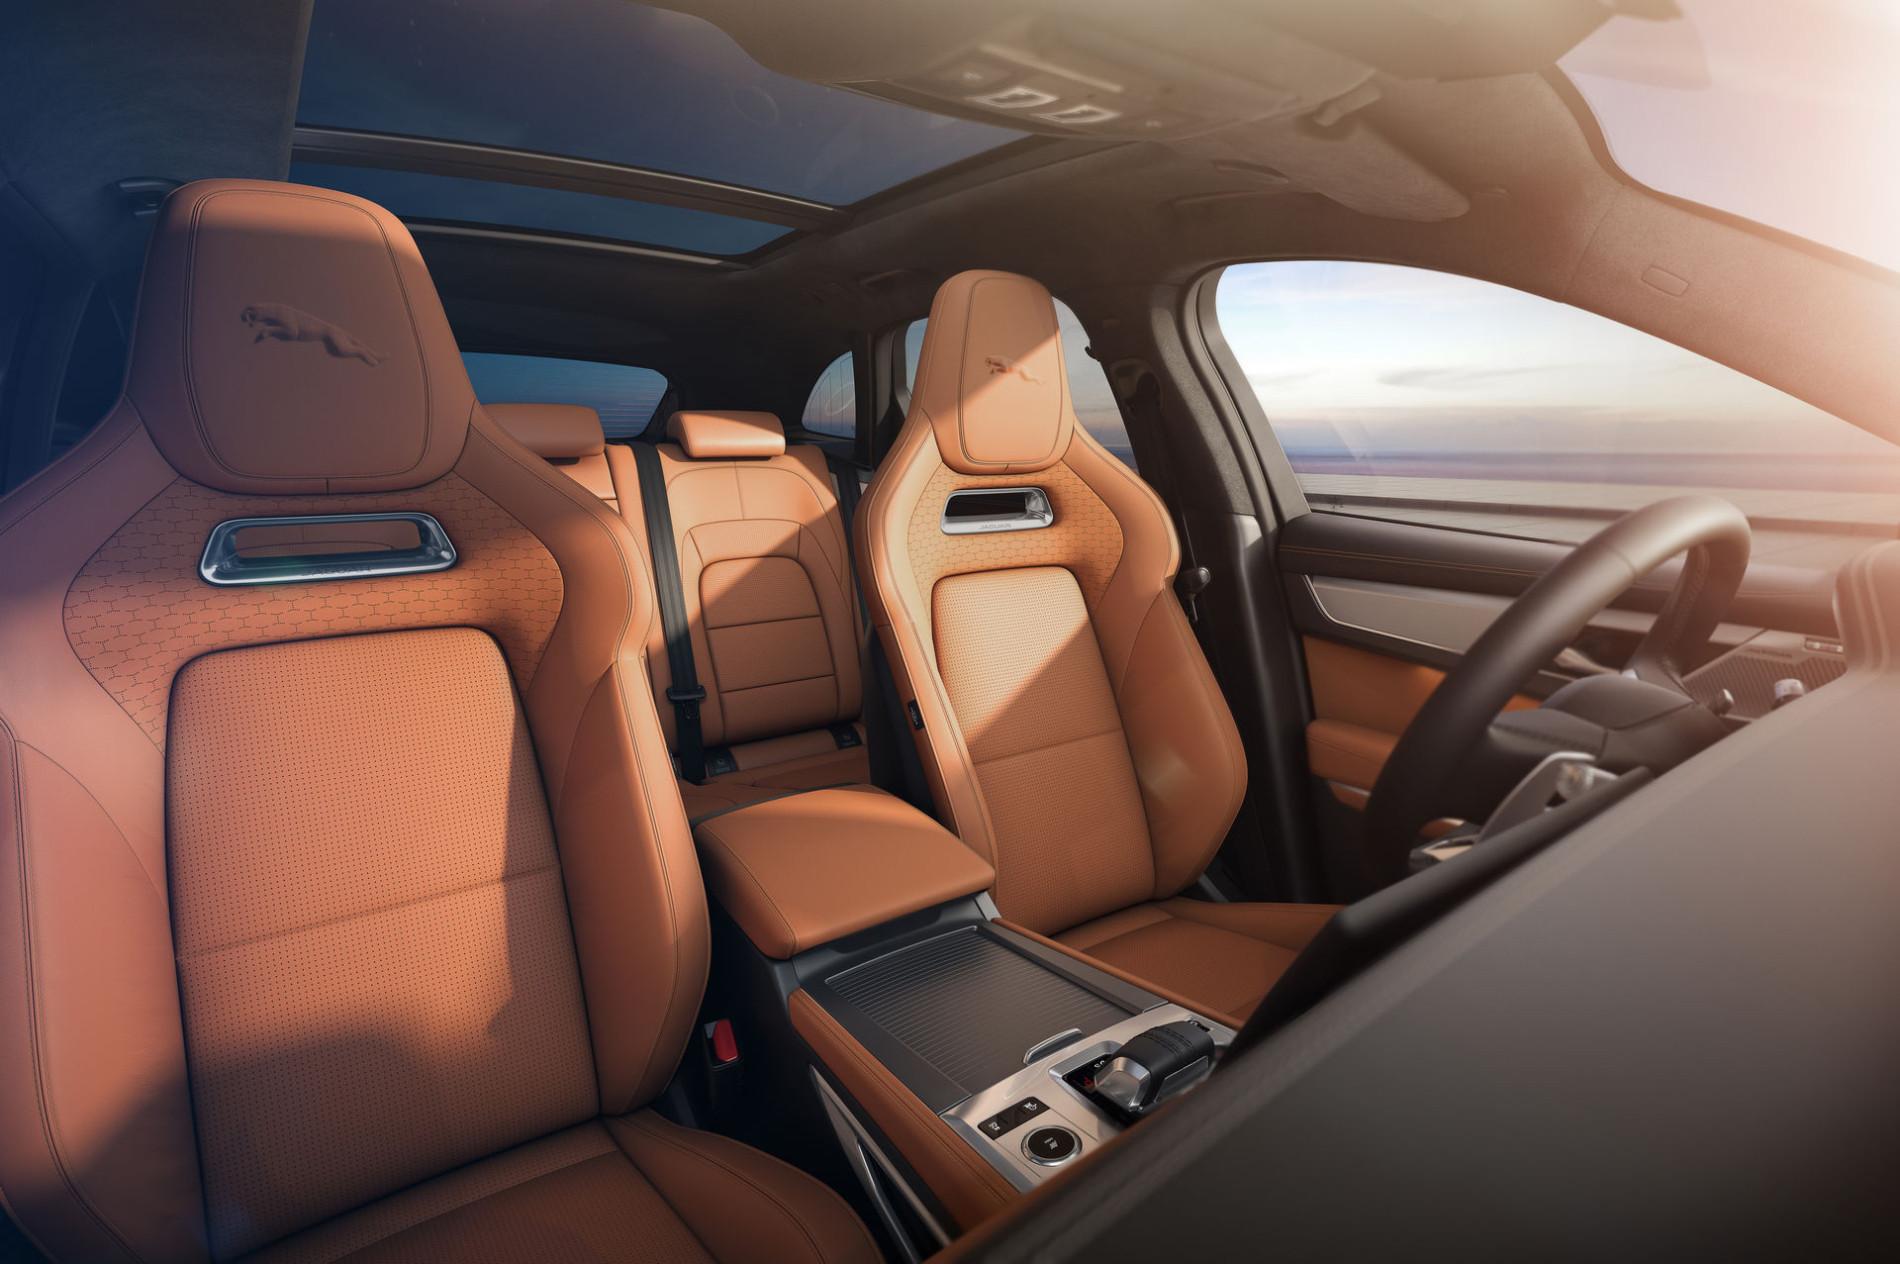 Jaguar F-Pace Facelift - Jaguar F-Pace Facelift